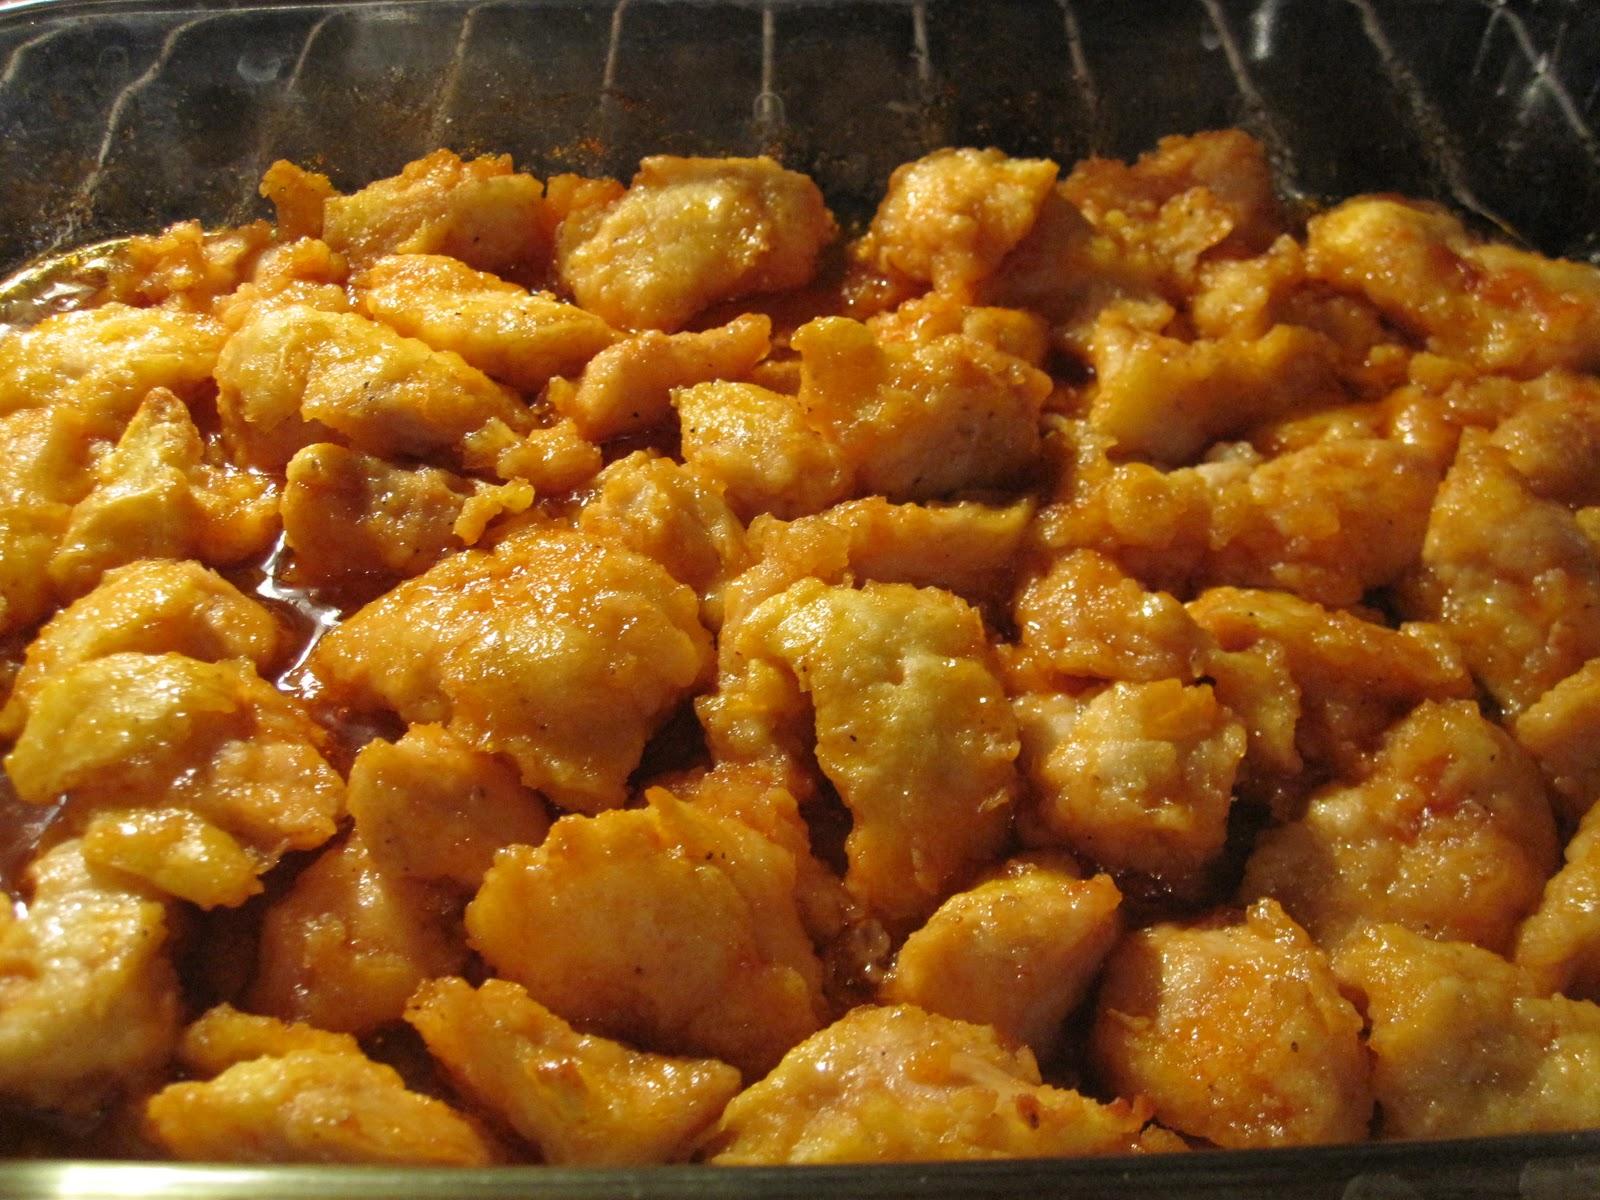 how to make baked chicken taste good